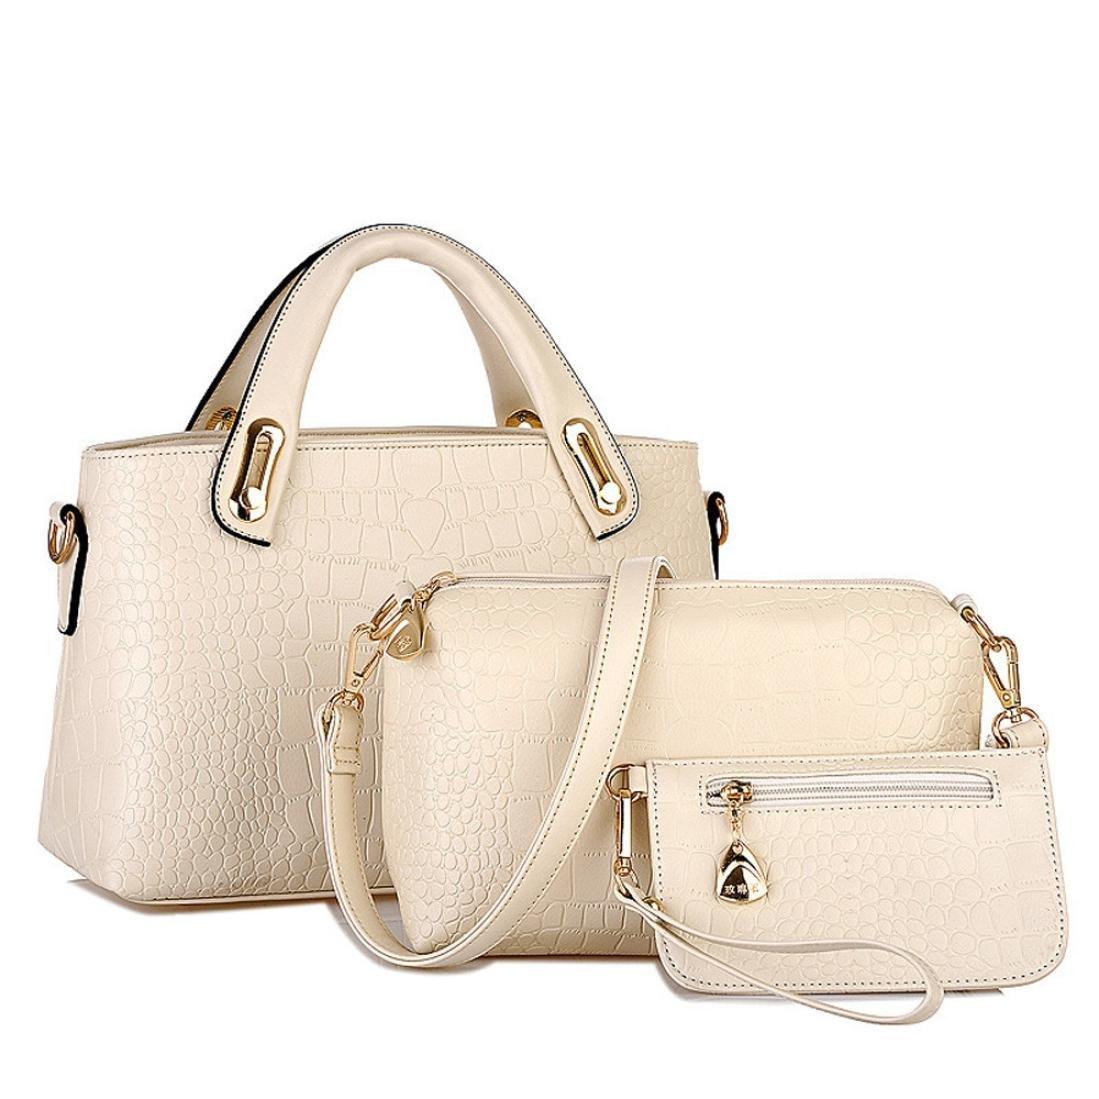 Franterd Women Ladies PU Leather Handbag Shoulder Bags Tote Purse Set